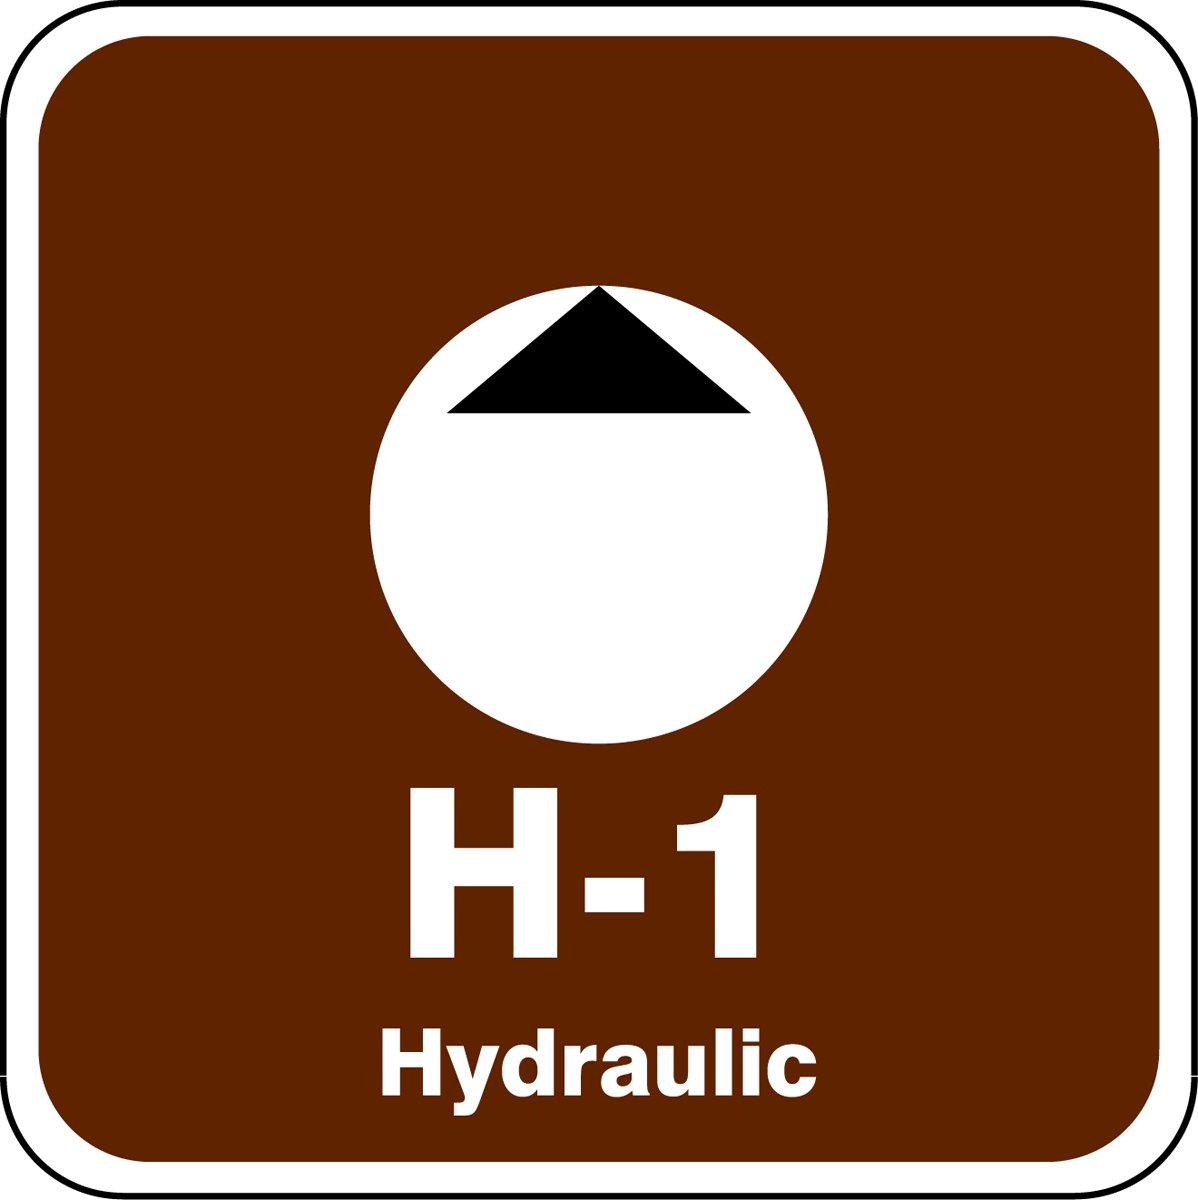 2-1//2 W x 2-1//2 L Accuform TDK501XVE Adhesive Dura-VinylH-1 Hydraulic Energy Source Shape ID Tag White//Black on Brown 2-1//2 W x 2-1//2 L